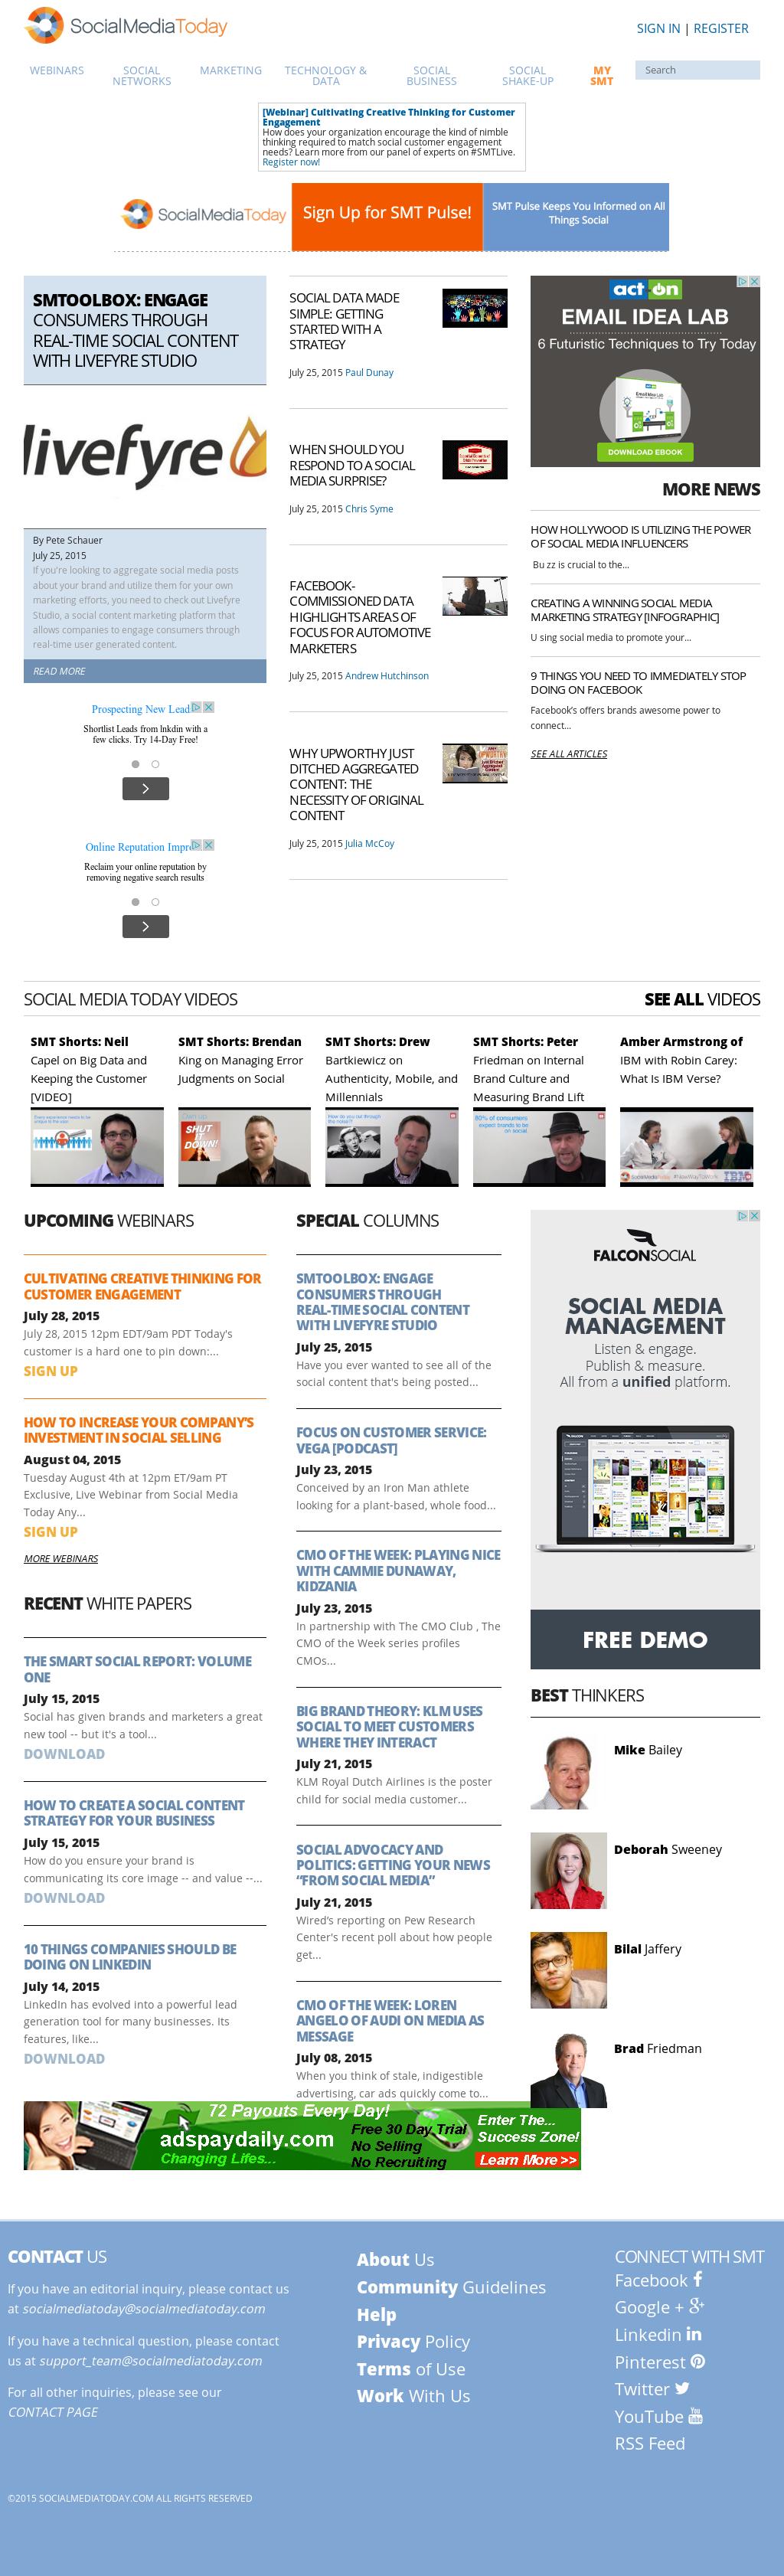 social media company profile pdf